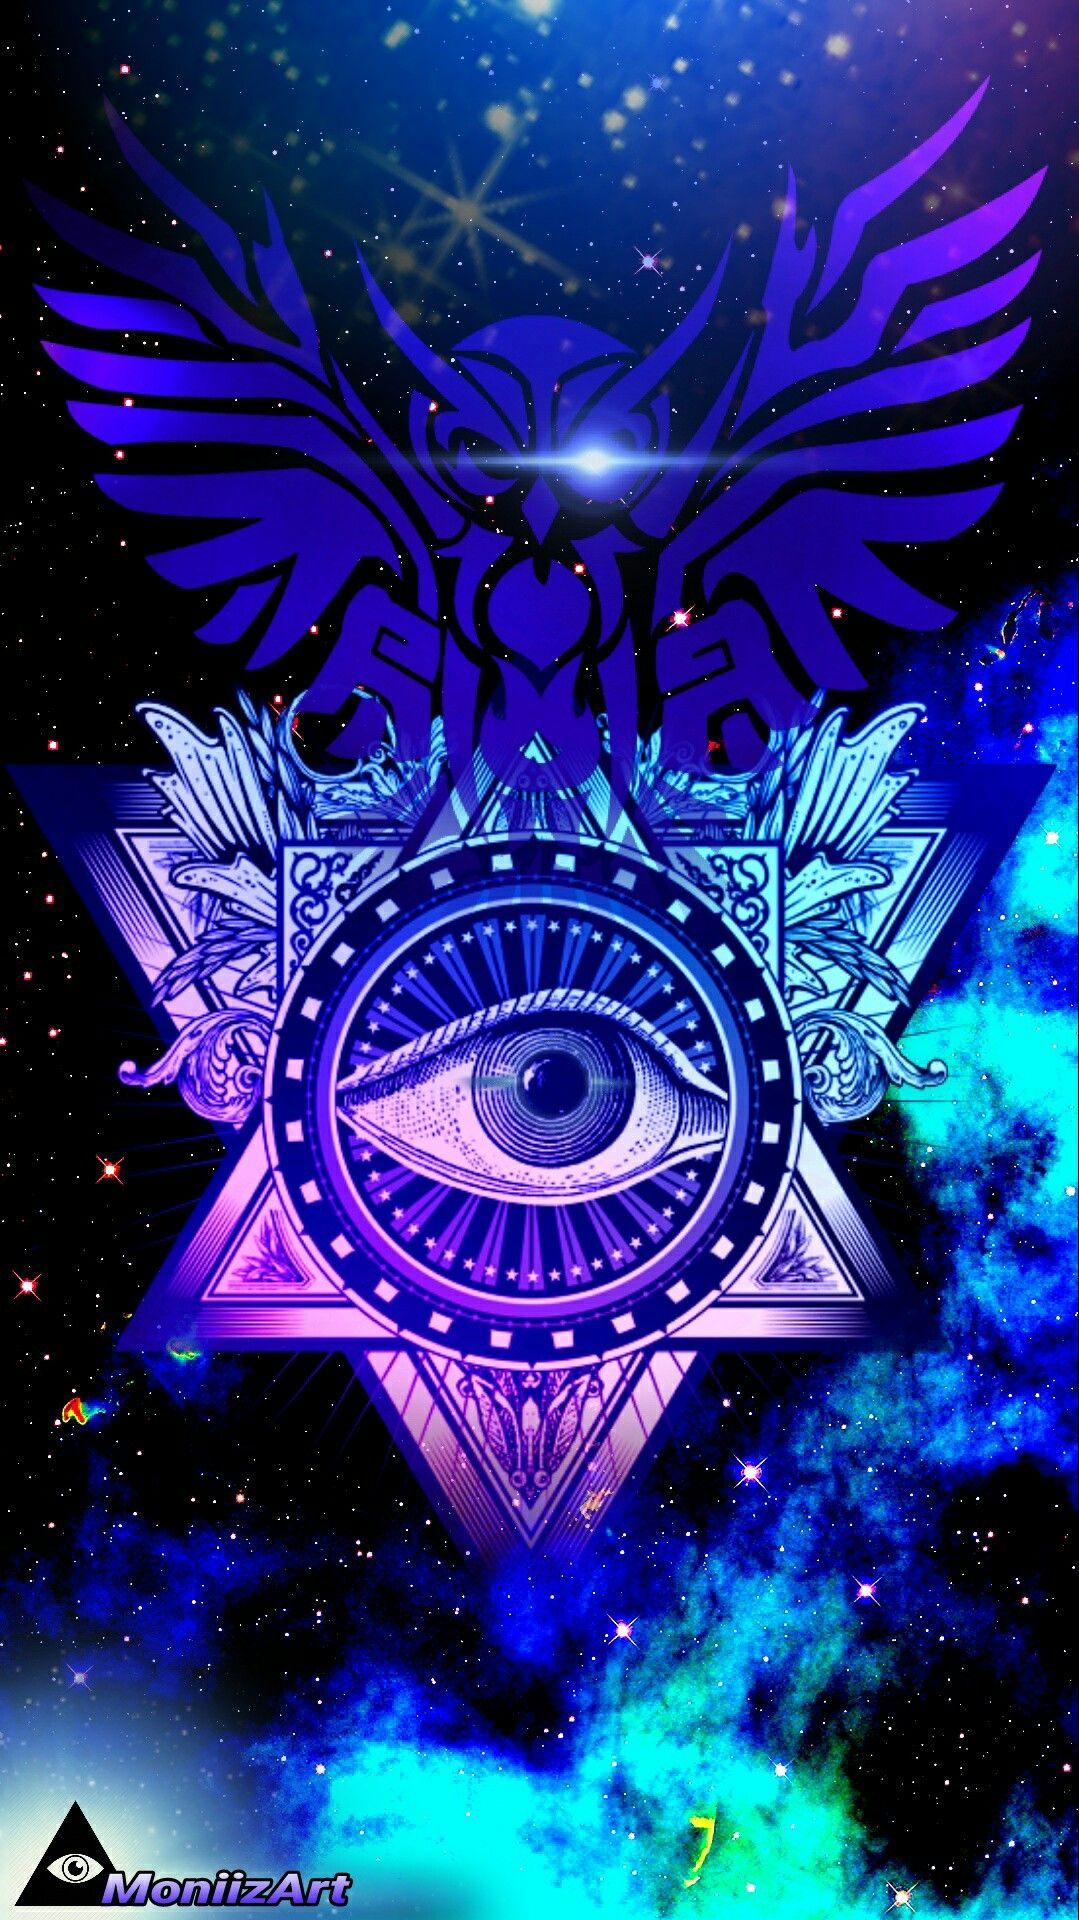 Iiluminati Wallpaper Full Hd Iluminati Monizart Papeis De